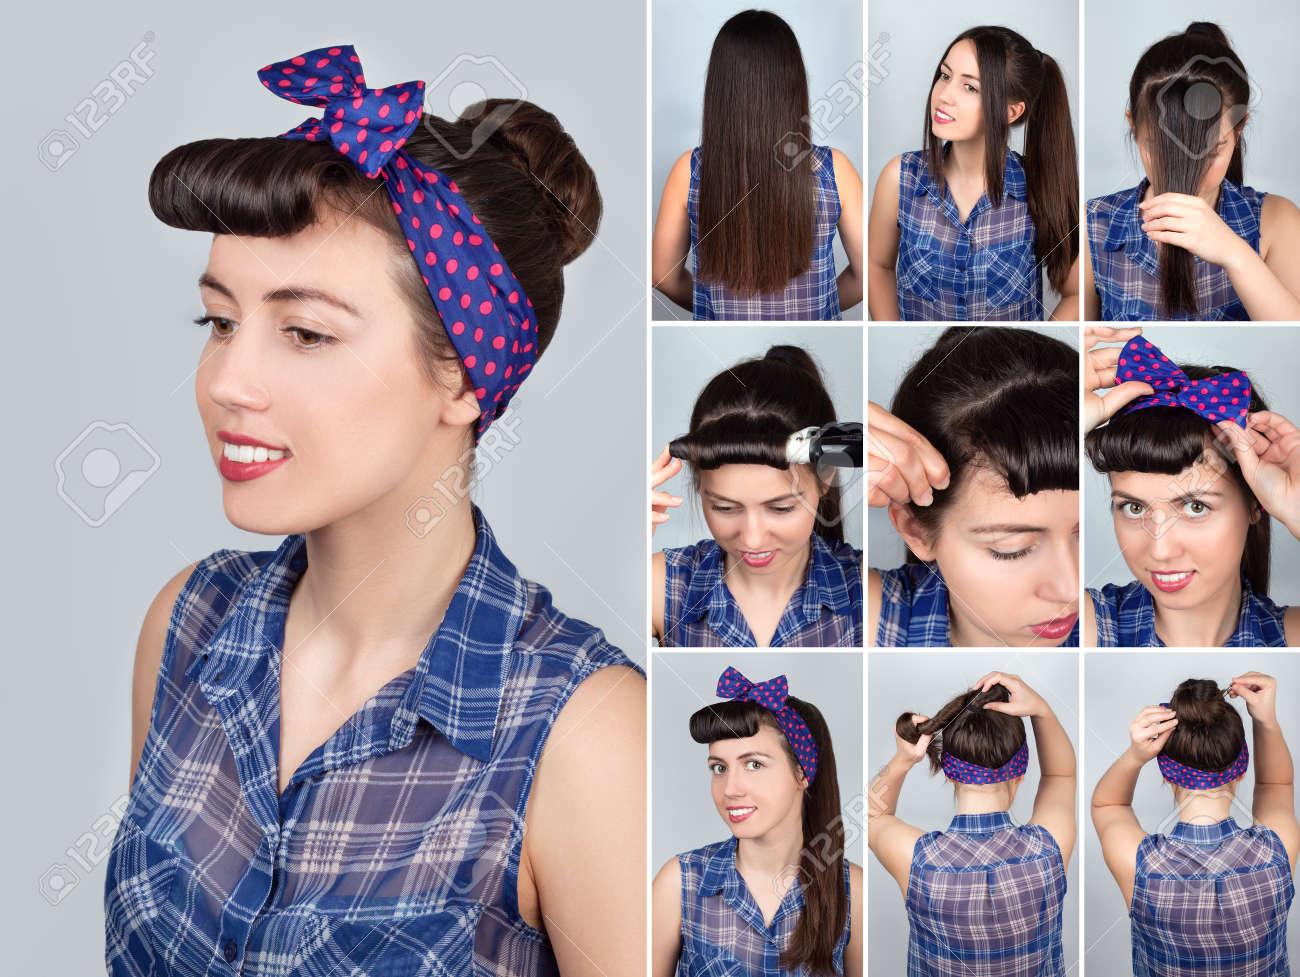 Astounding Hair Tutorial Stock Photos Amp Pictures Royalty Free Hair Tutorial Short Hairstyles For Black Women Fulllsitofus